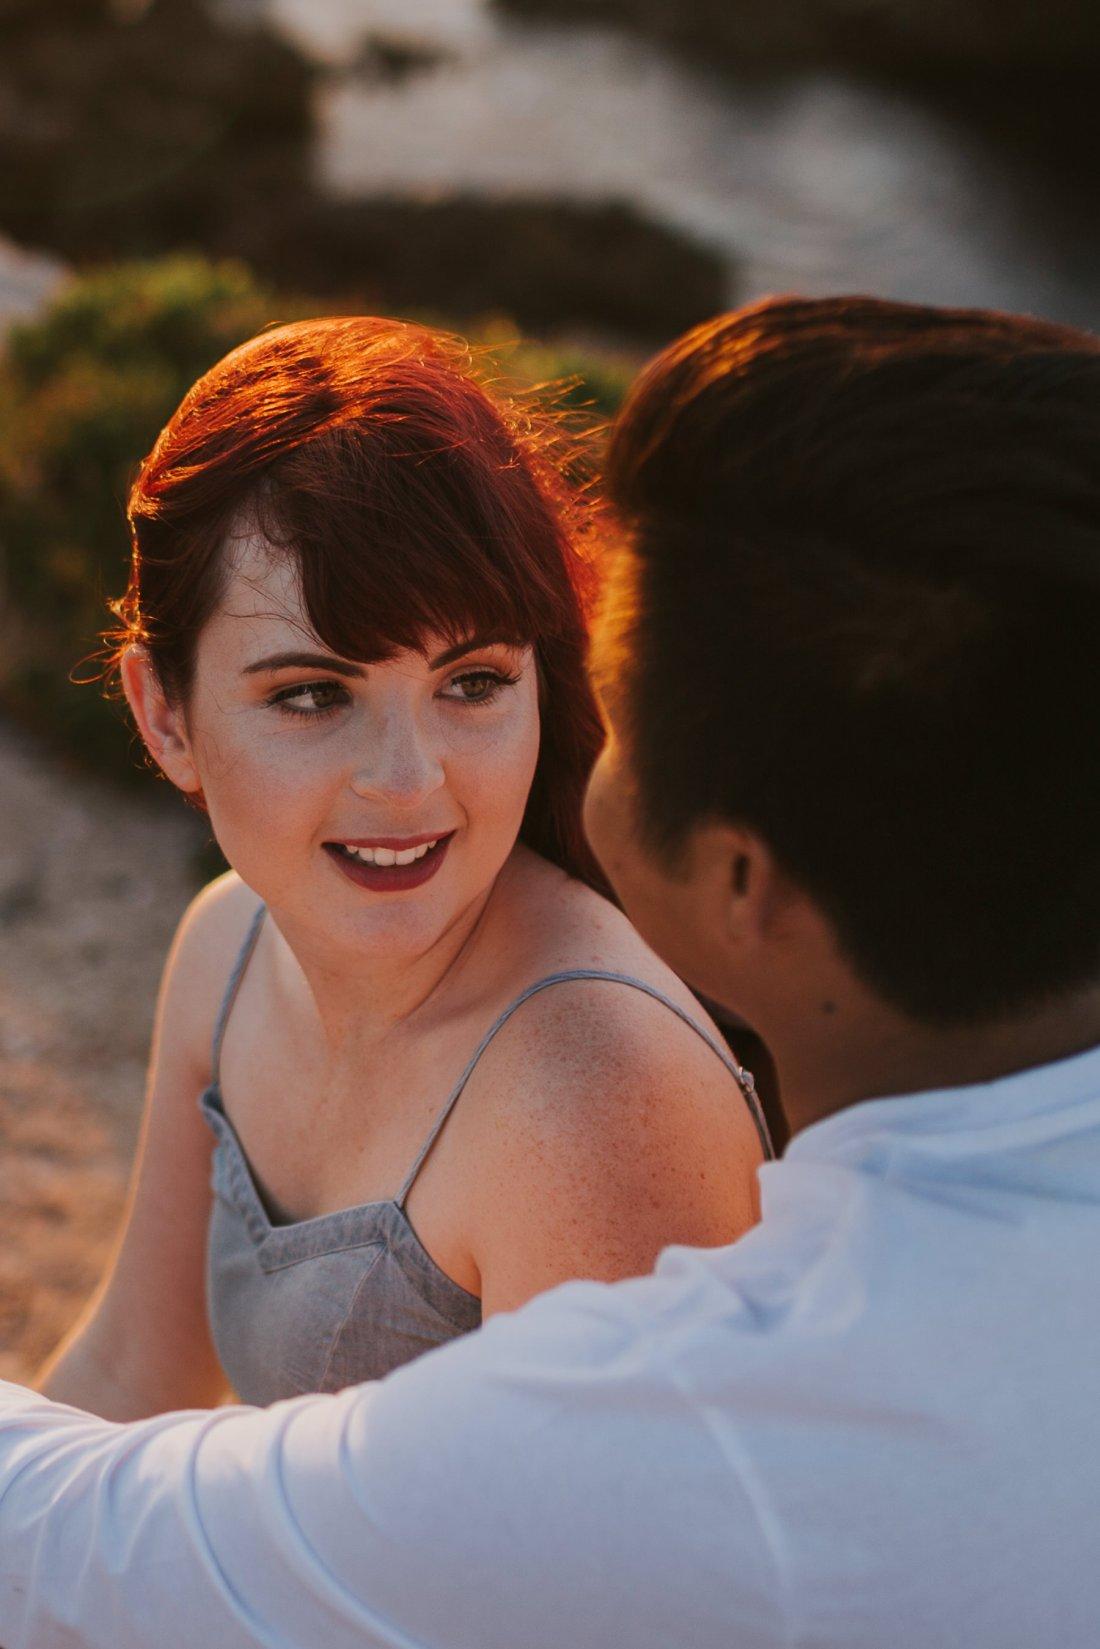 Ebony Blush Photography | Perth Wedding Photographer | Paton + Klyde | Engagement66Beach Engagement Photos, Perth